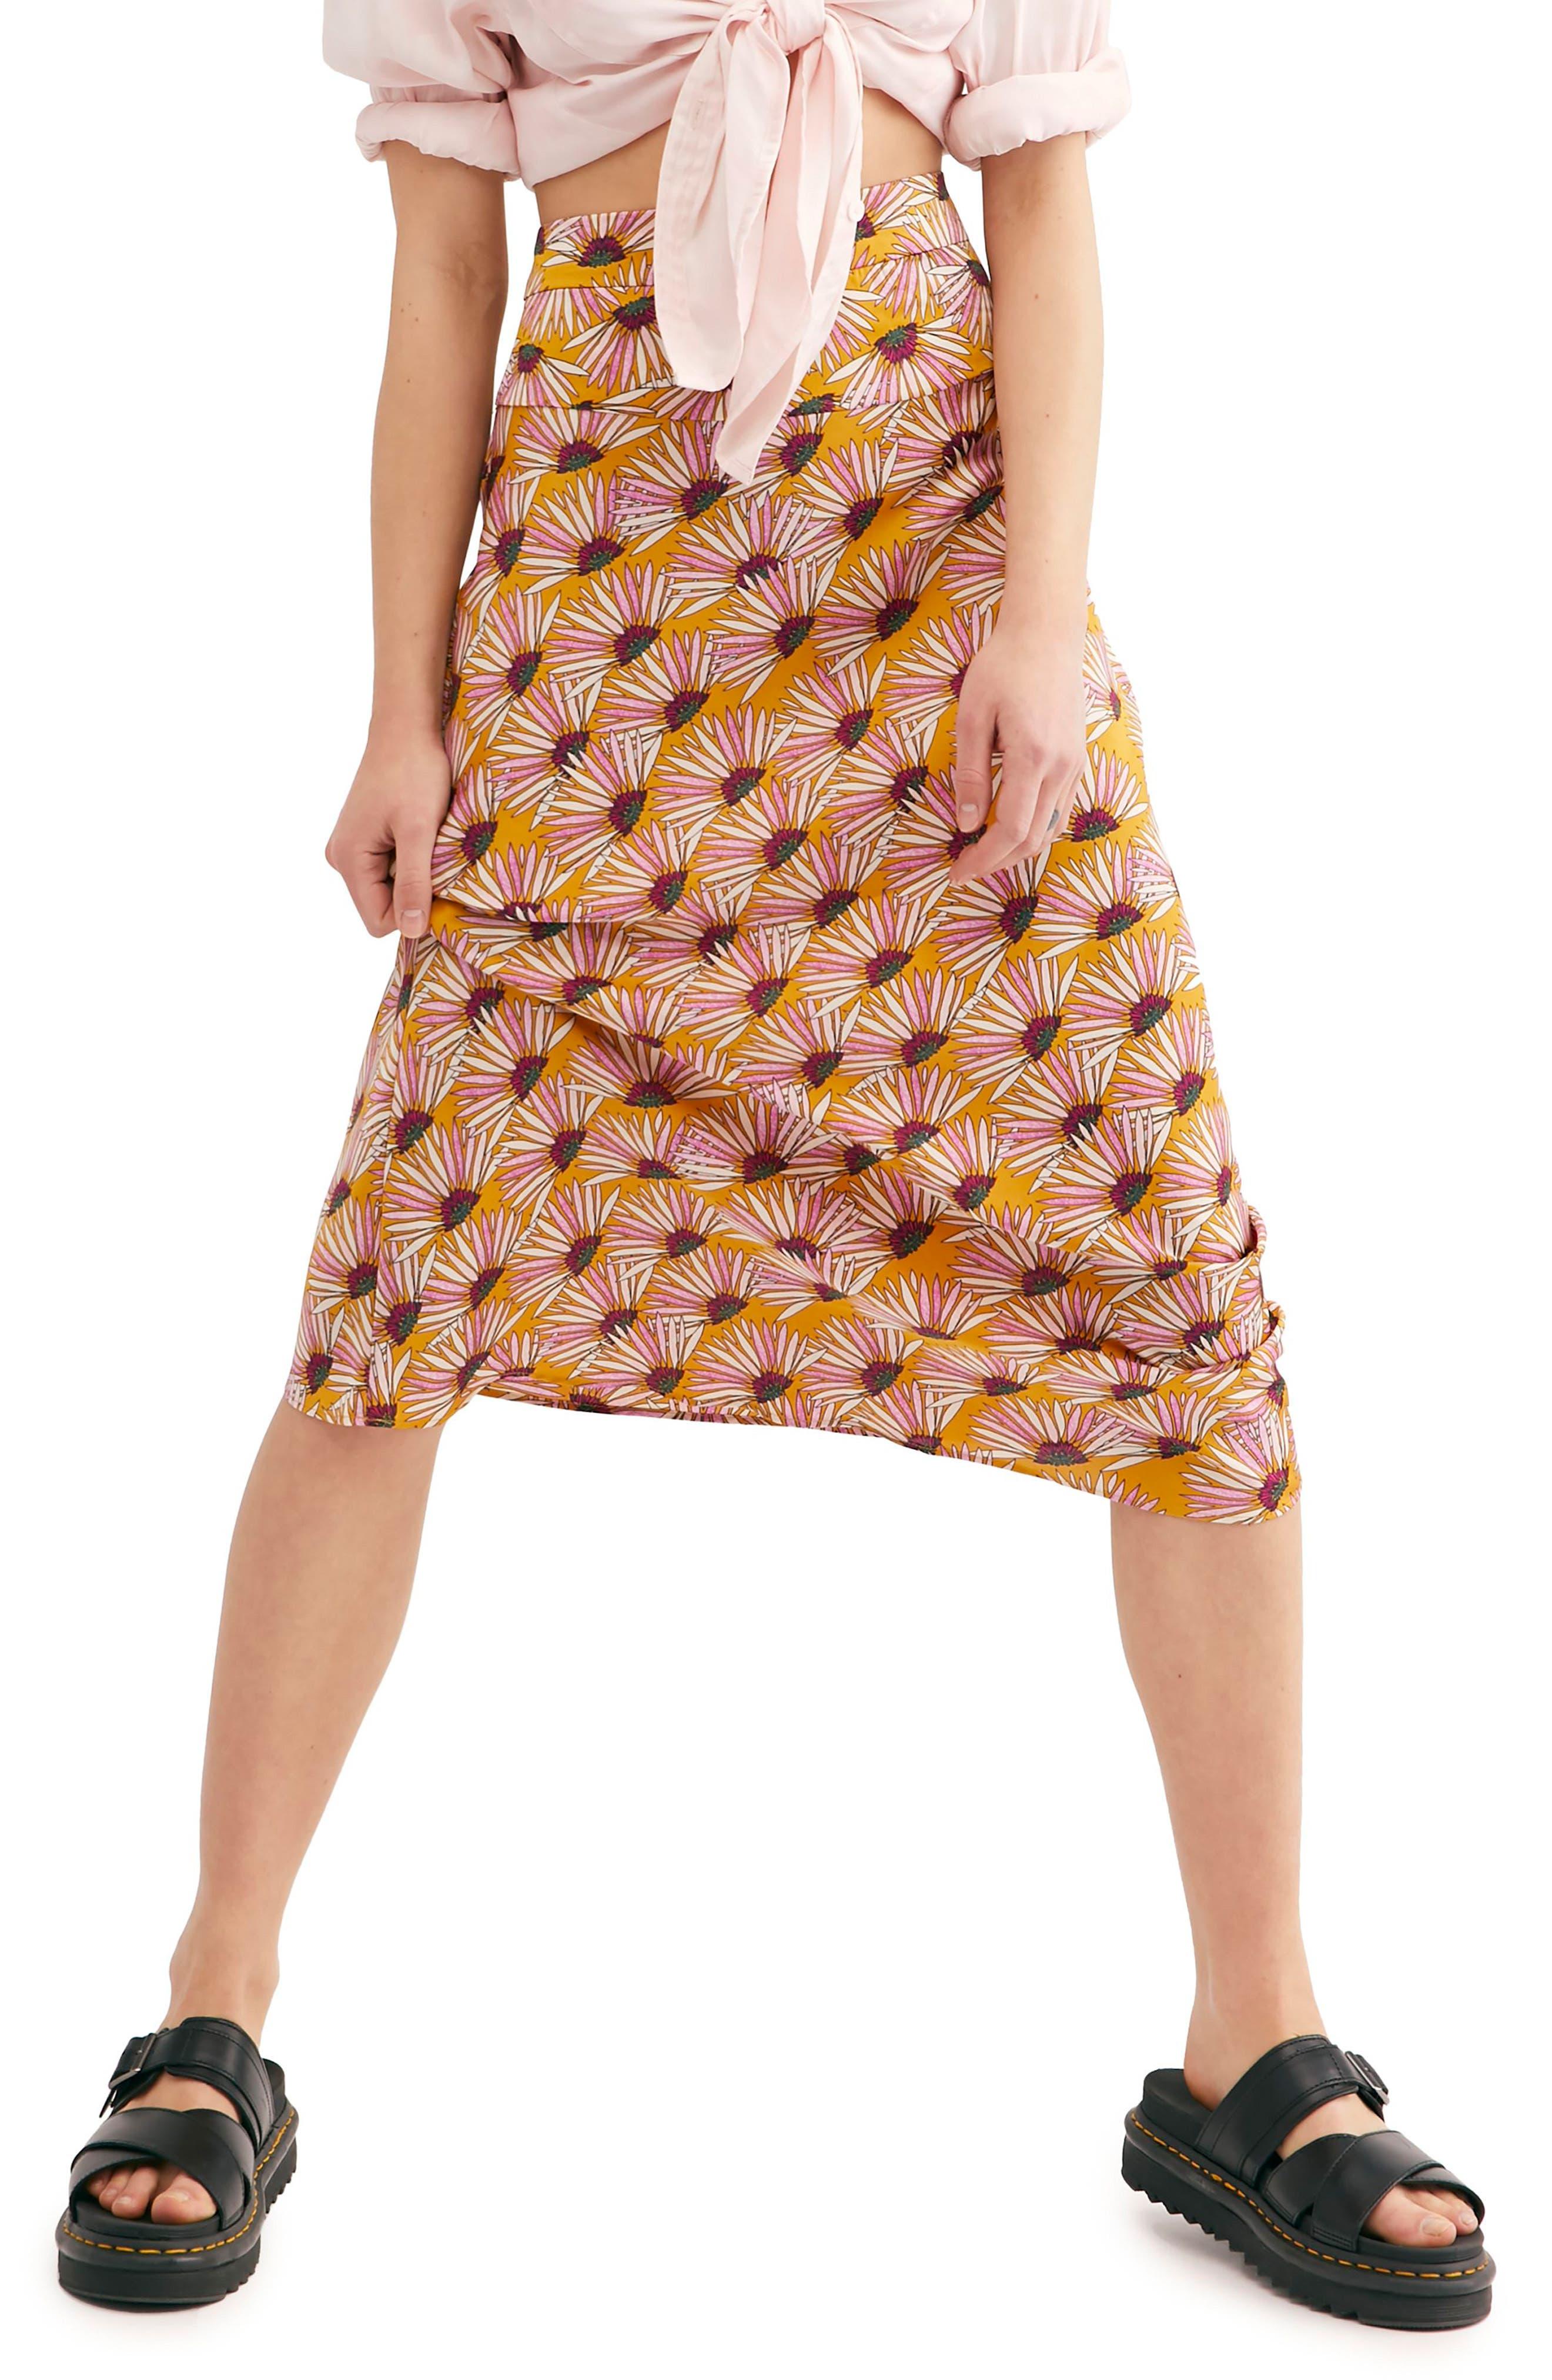 Clothing, Shoes & Accessories Skirts Womens Free People Geometric Print Skirt 4 Small Black Boho